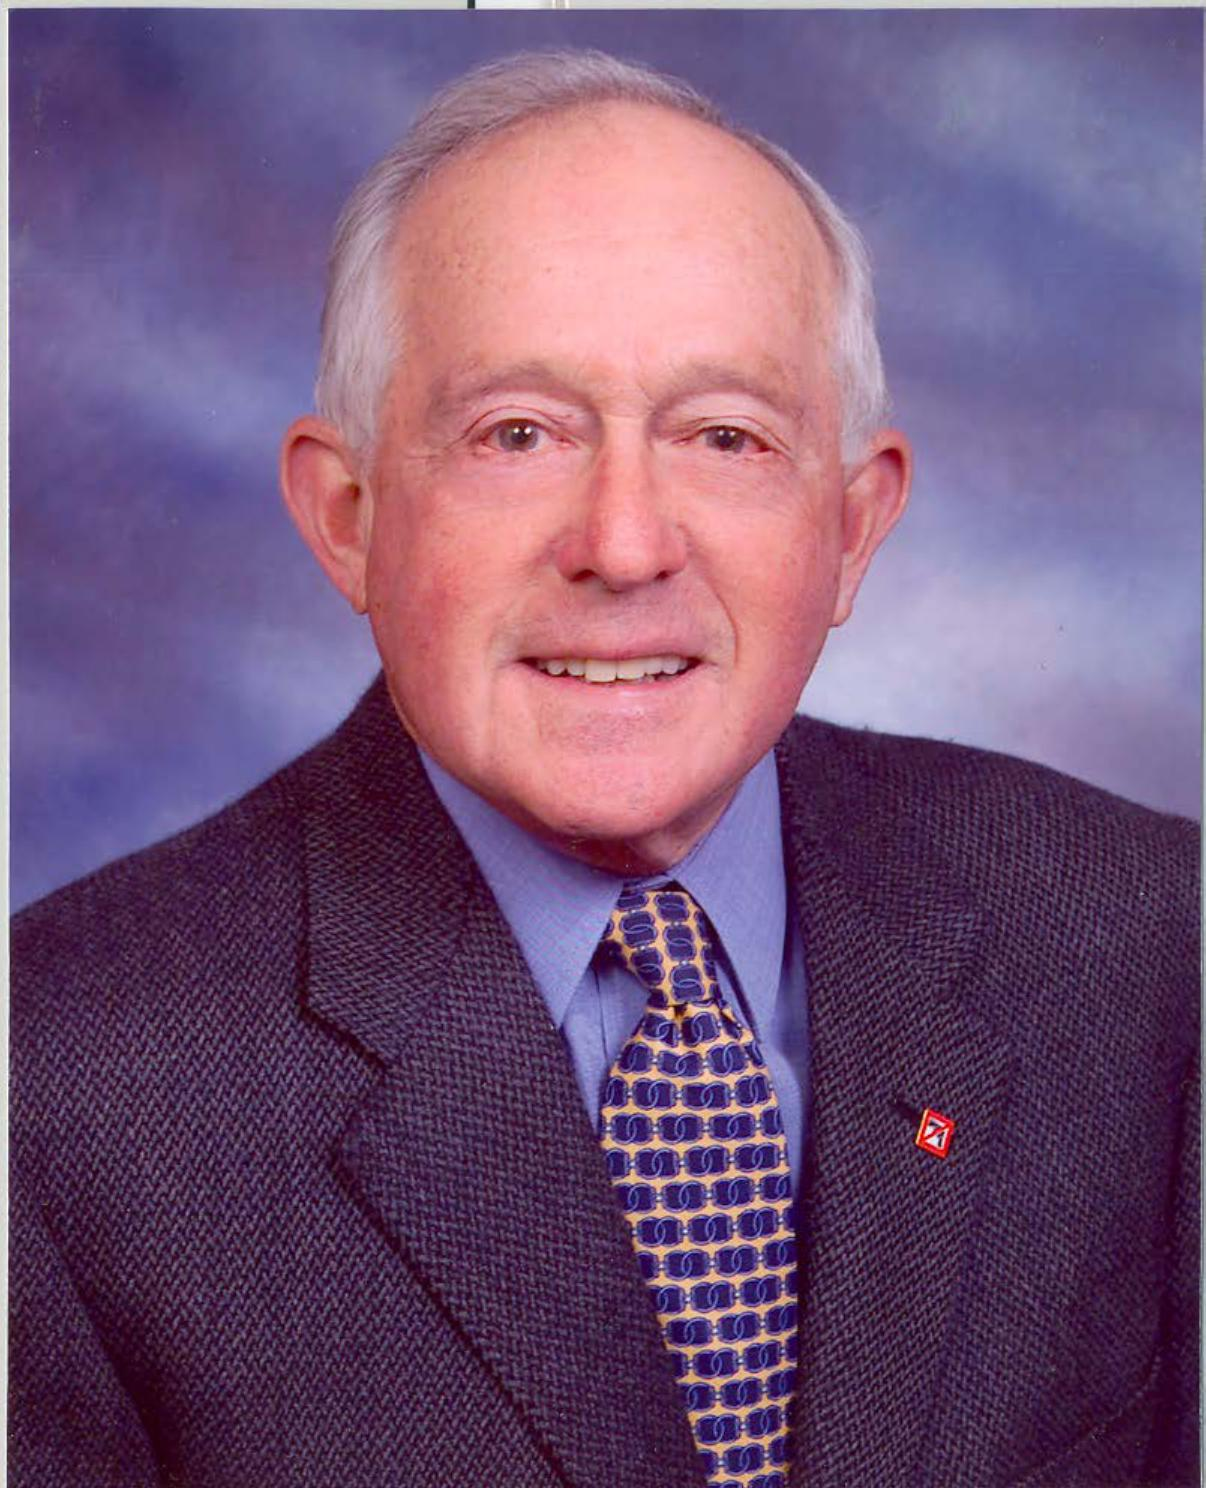 Donald A. Brown | Founding Partner, JBG Companies